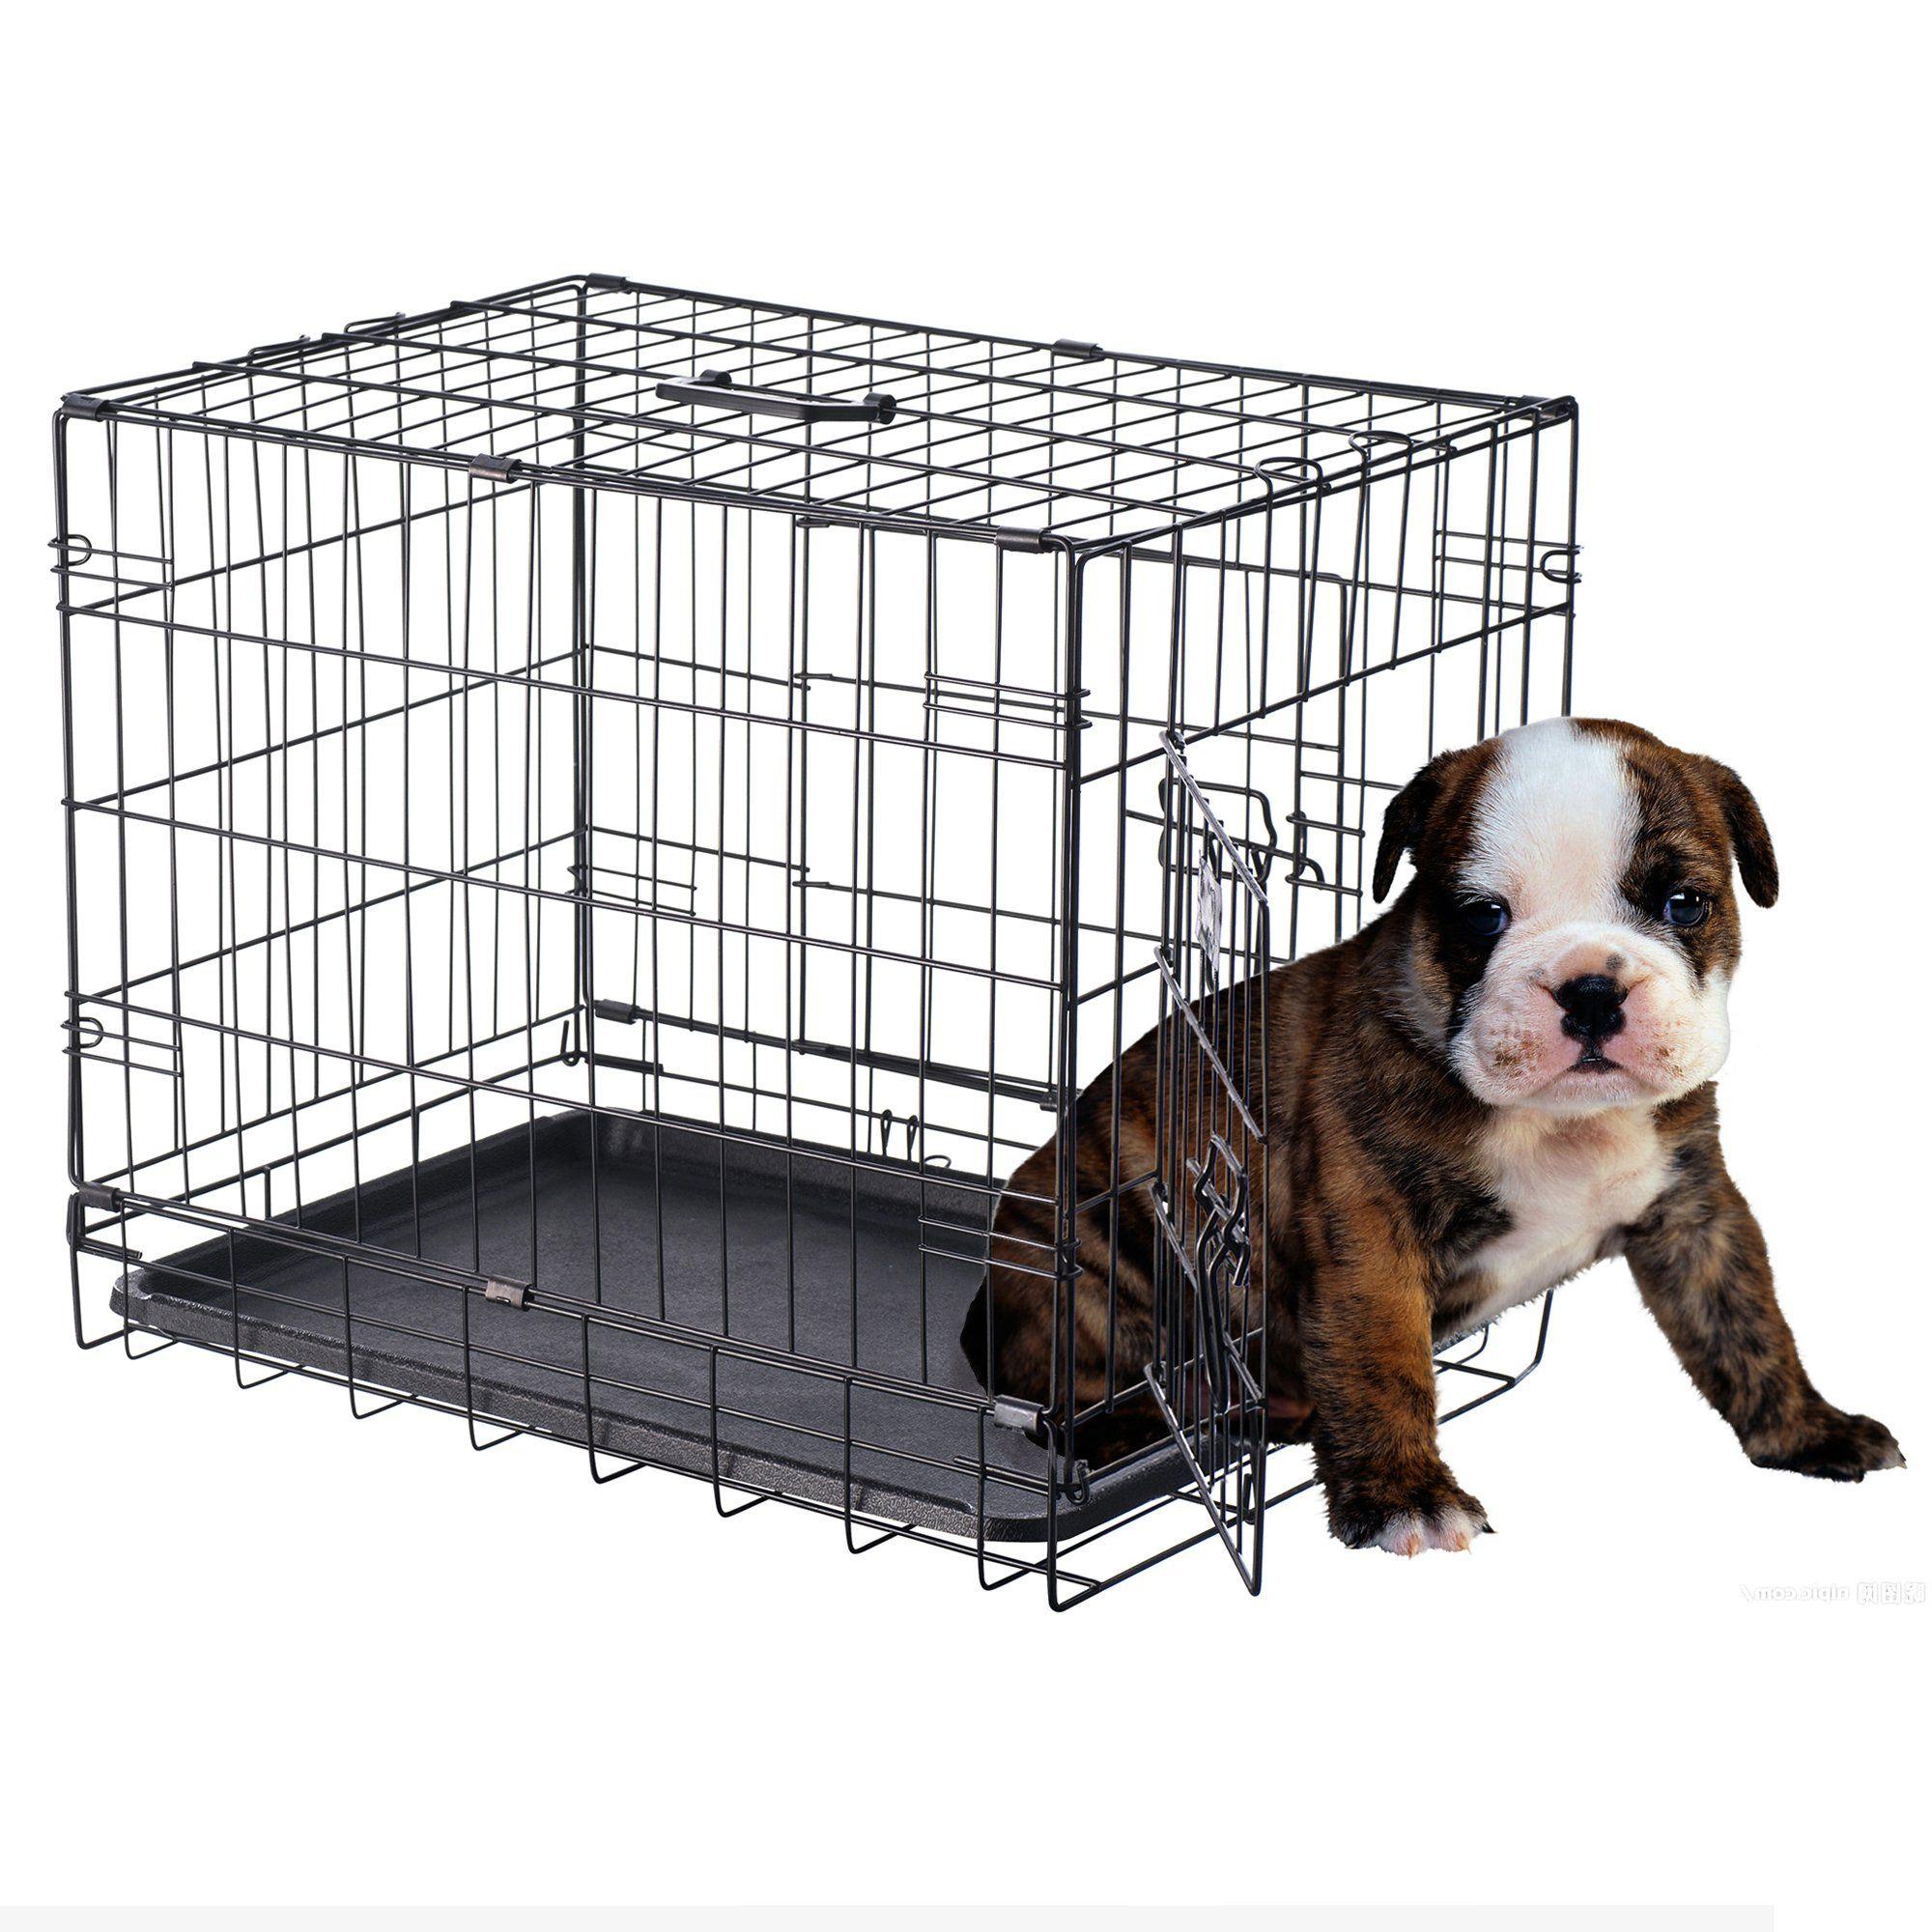 Pet Trex 2190 ABS 24 Inch Dog Crate Folding Pet Crate